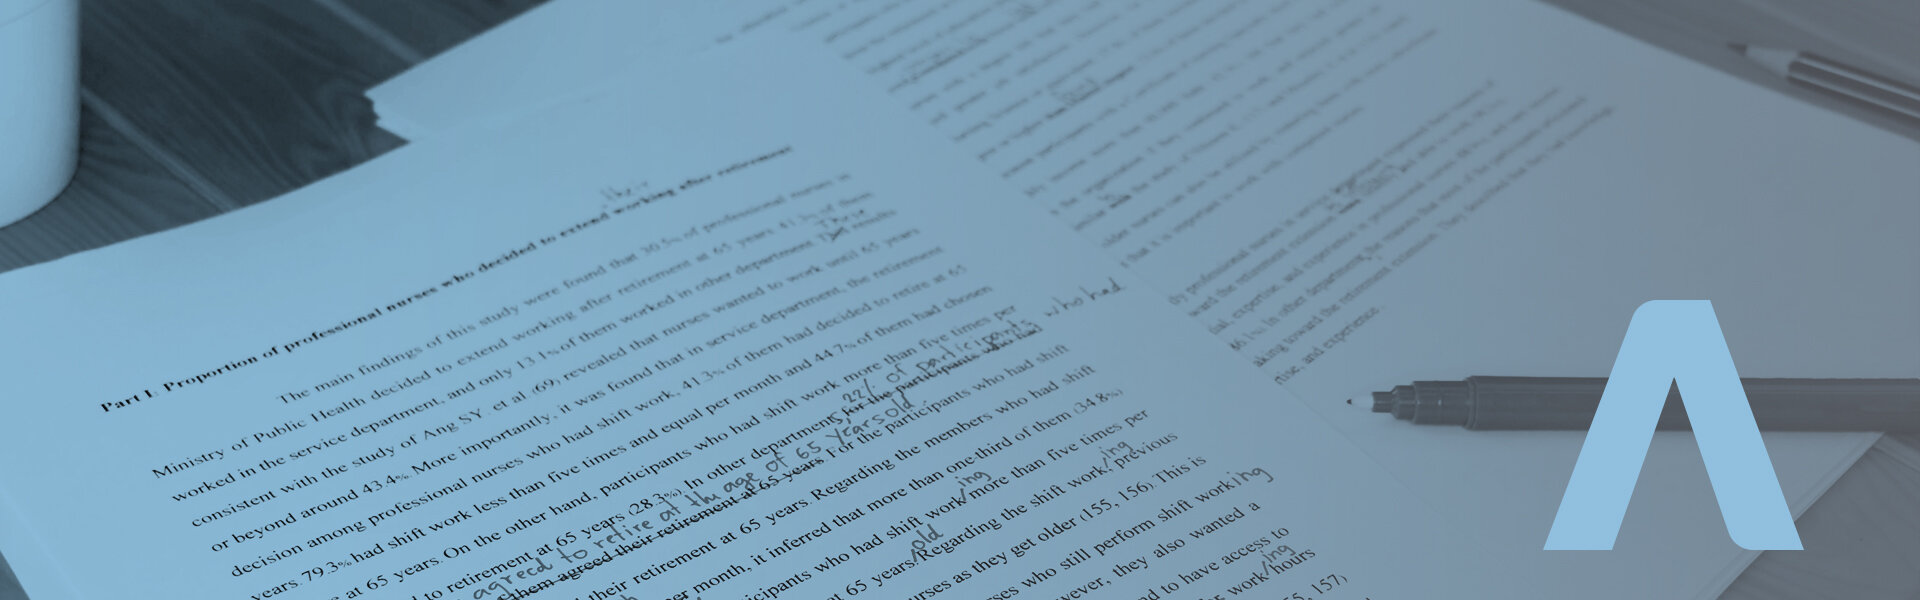 Grammar and punctuation.jpg